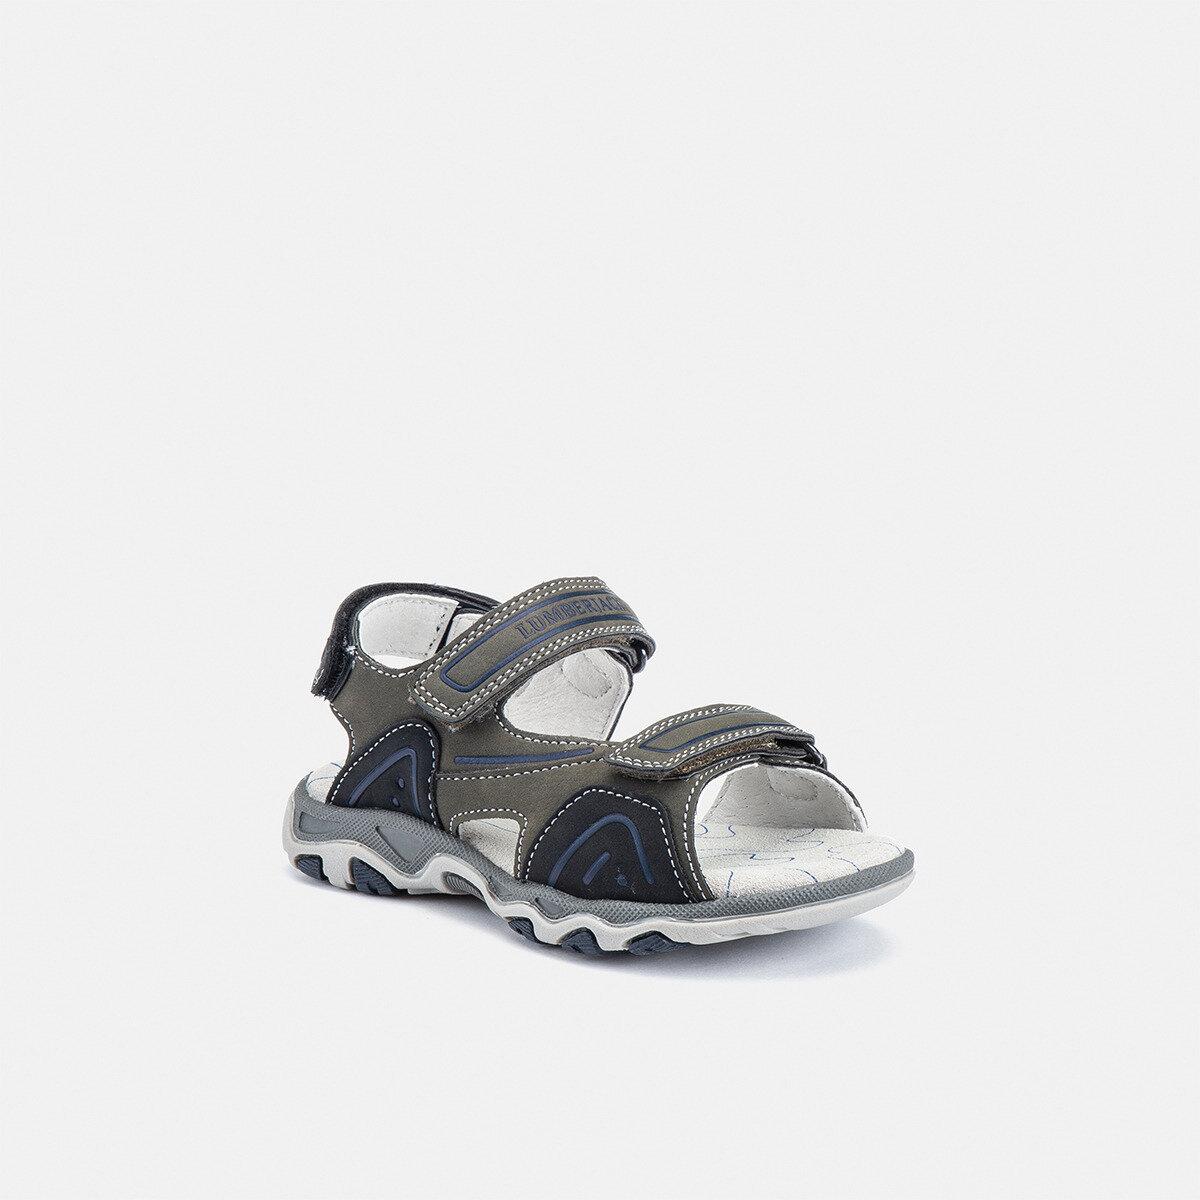 LEVI MILITARY GREEN/BLACK Boy Sandals